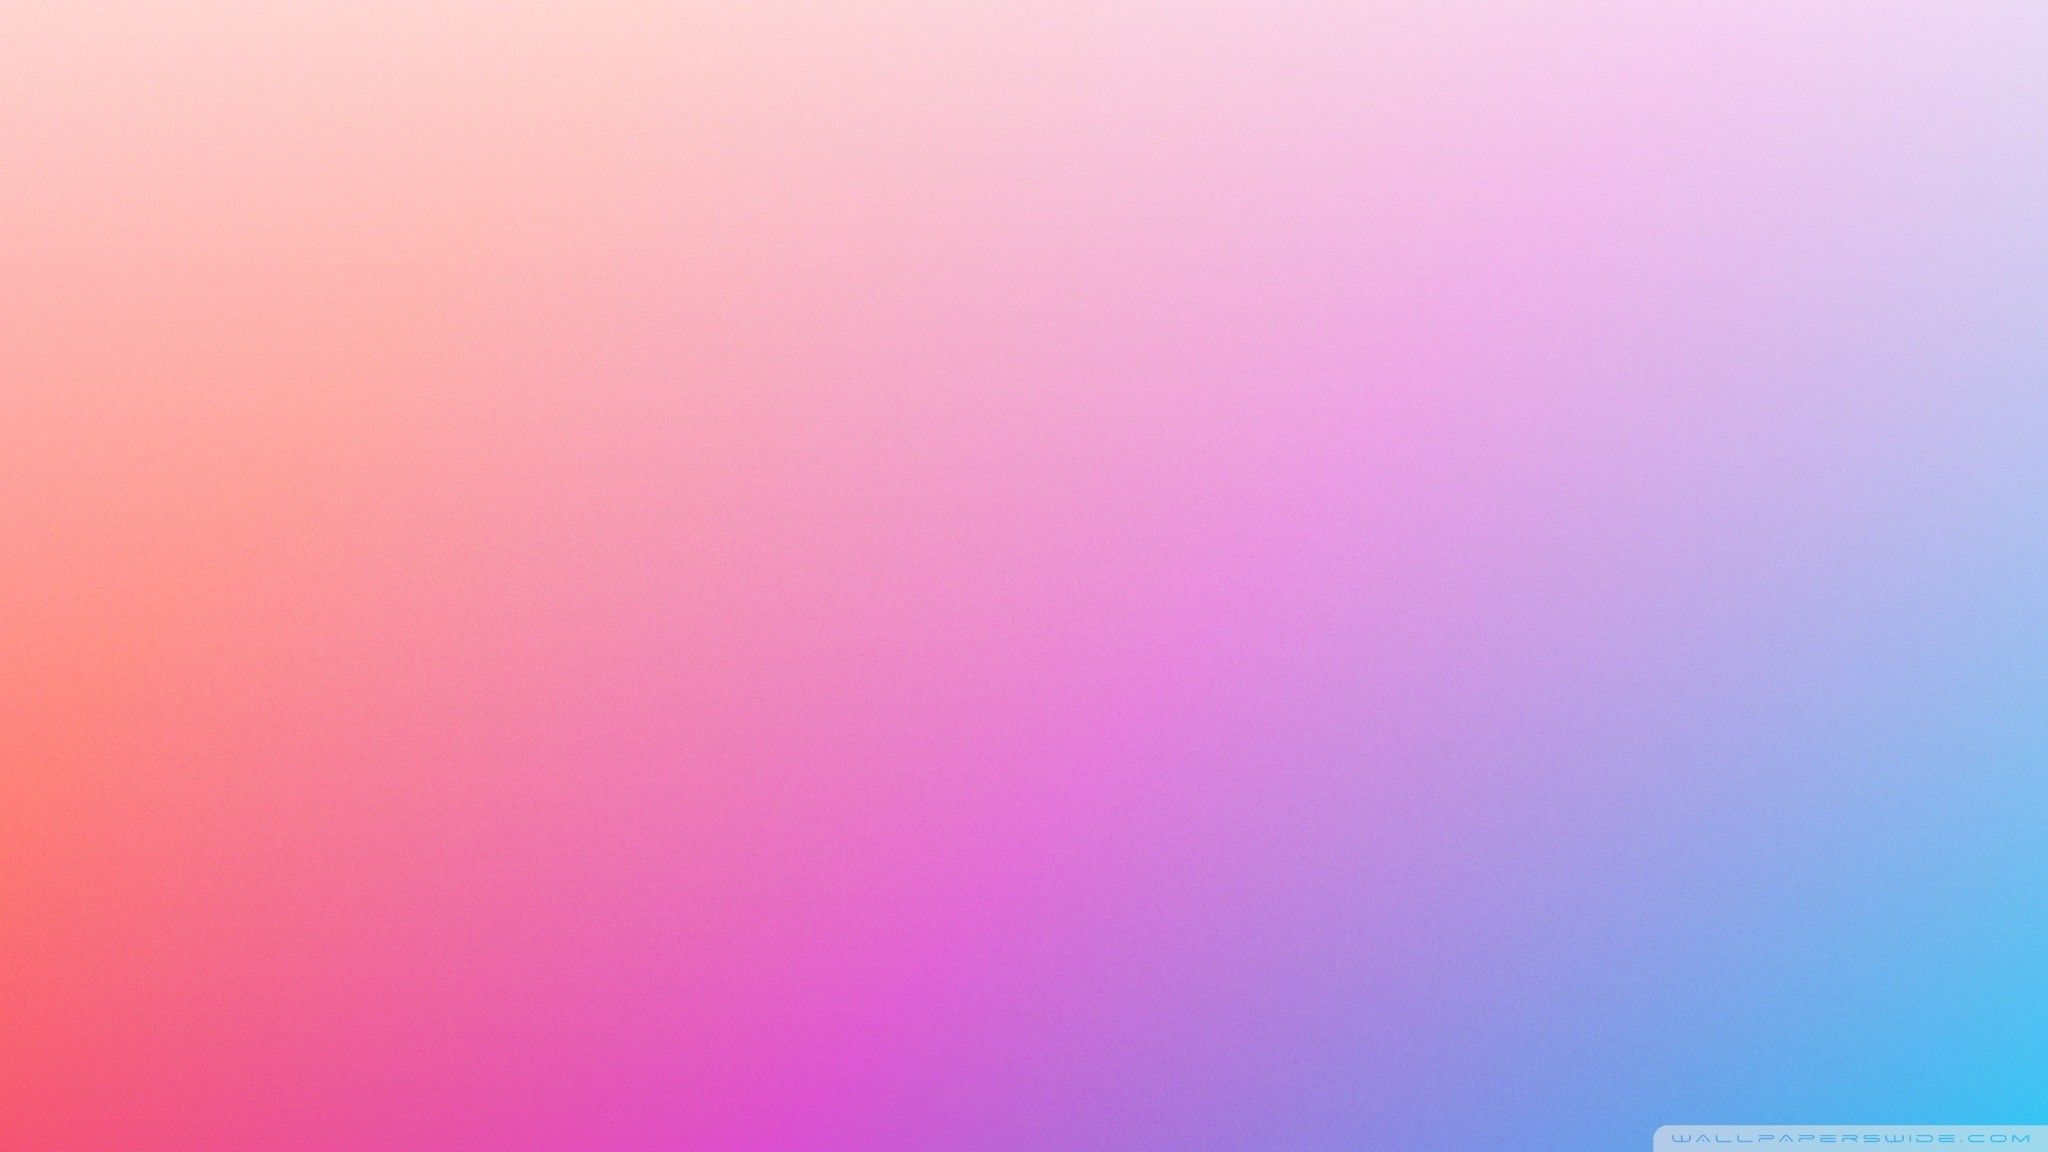 2048x1152 Hd 16 9 Pink Wallpaper Iphone Iphone Wallpaper Pink Wallpaper